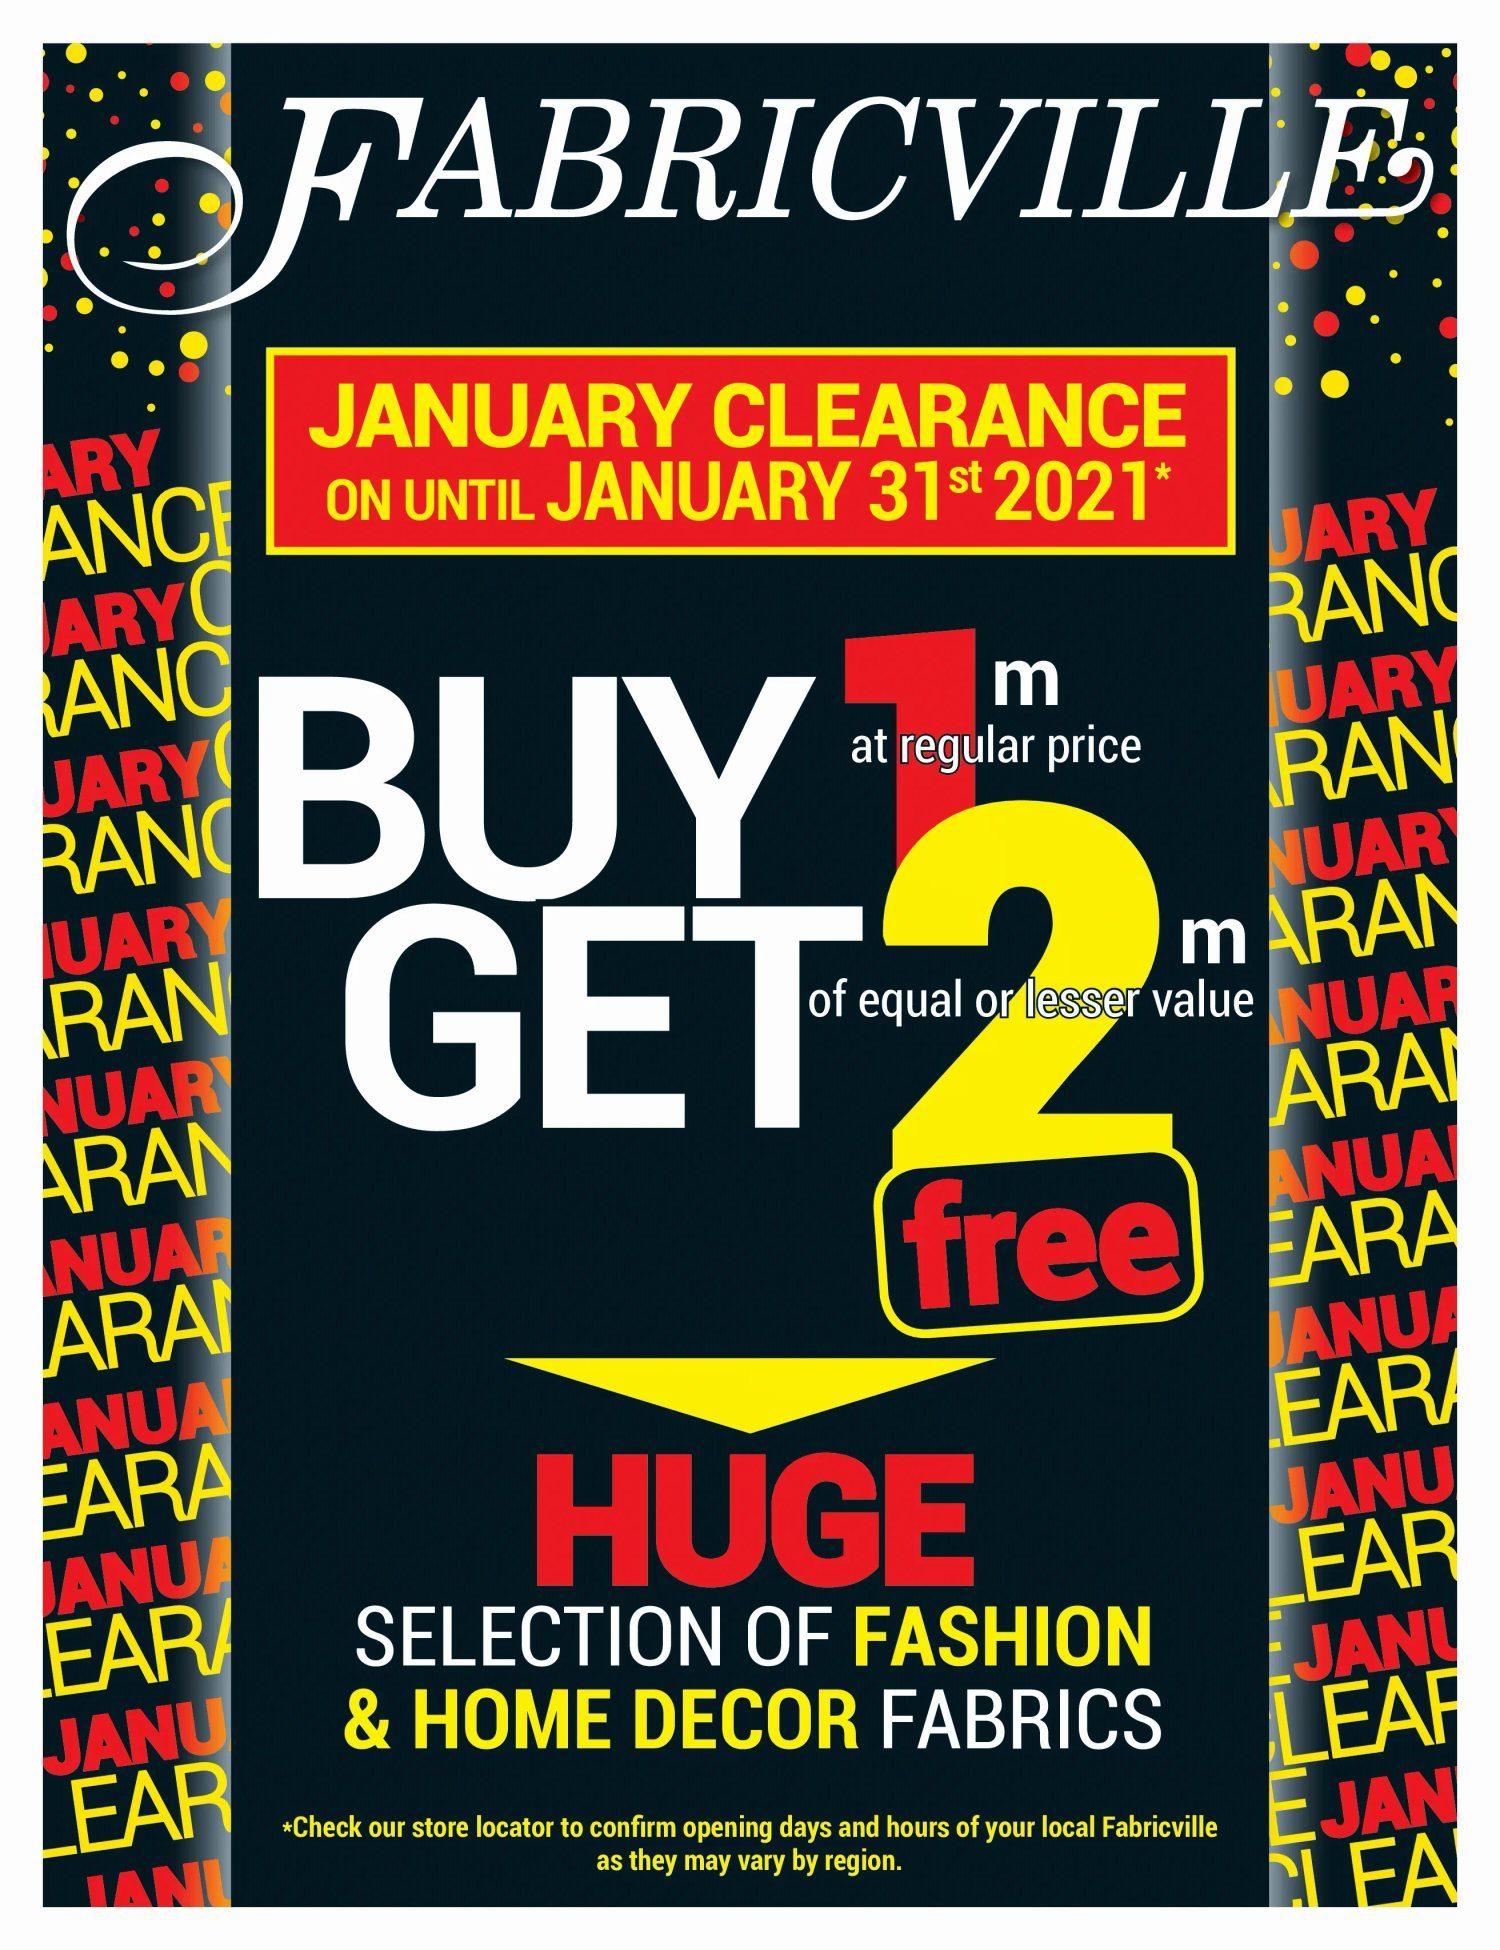 Fabricville - January Clearance Sale